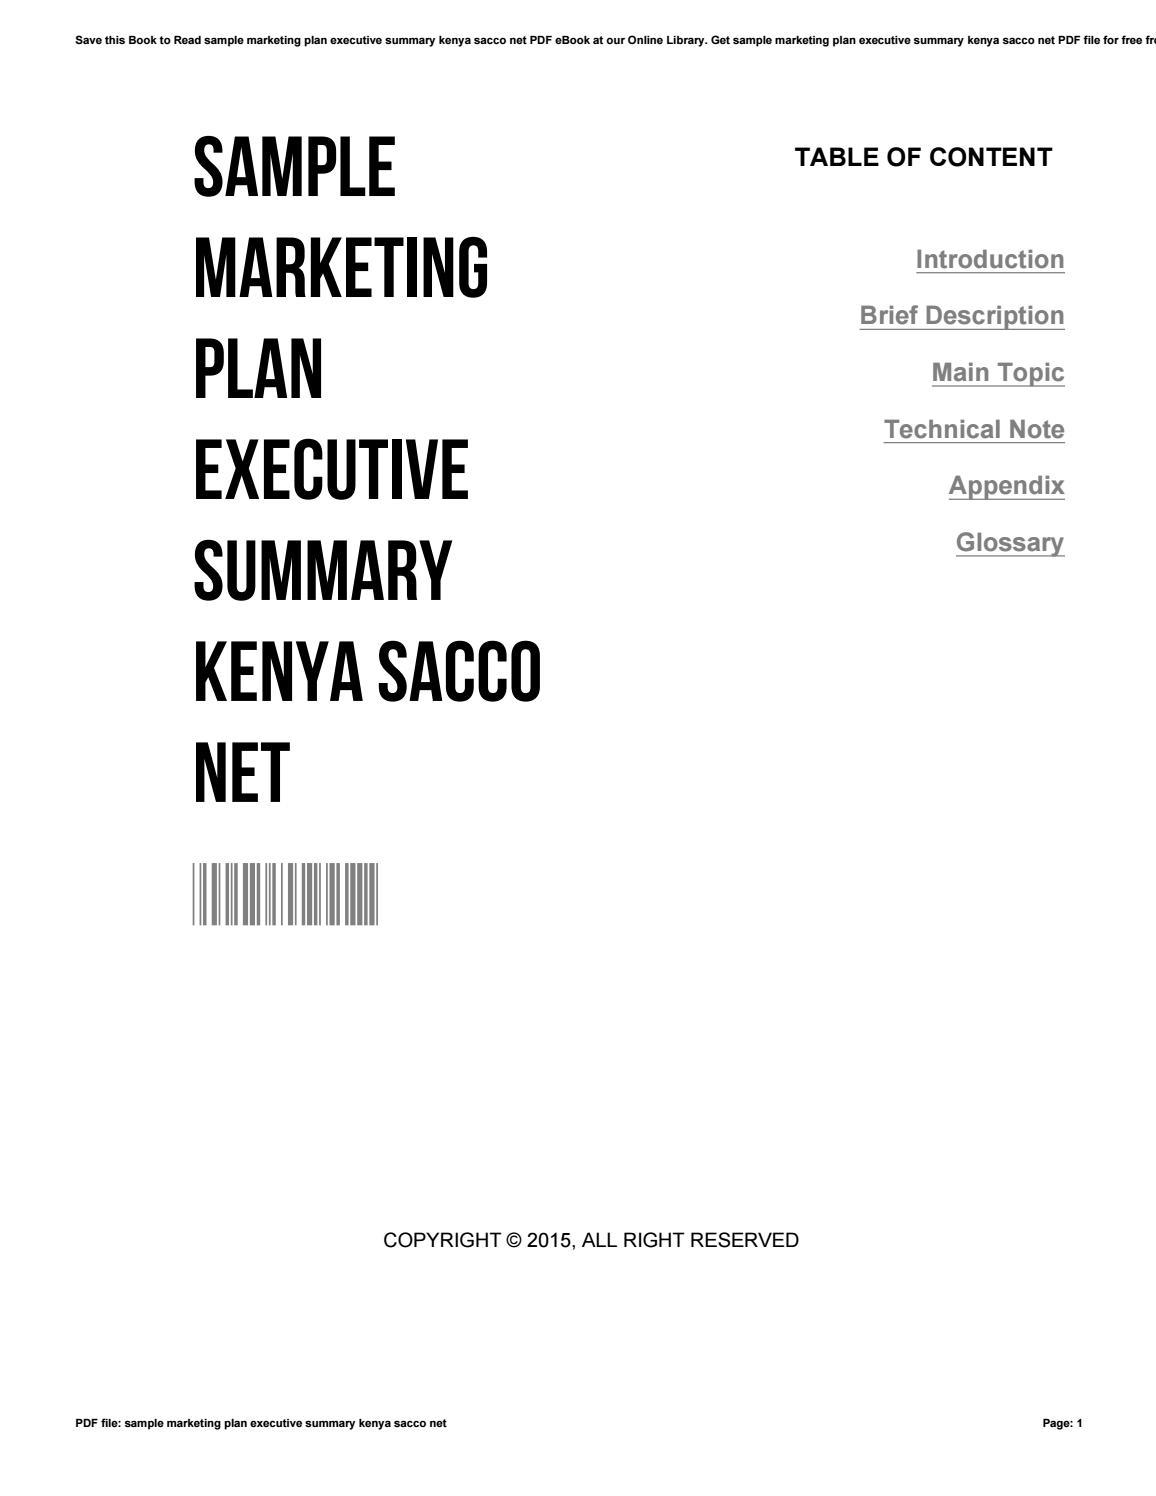 sample marketing plan executive summary kenya sacco net by. Black Bedroom Furniture Sets. Home Design Ideas